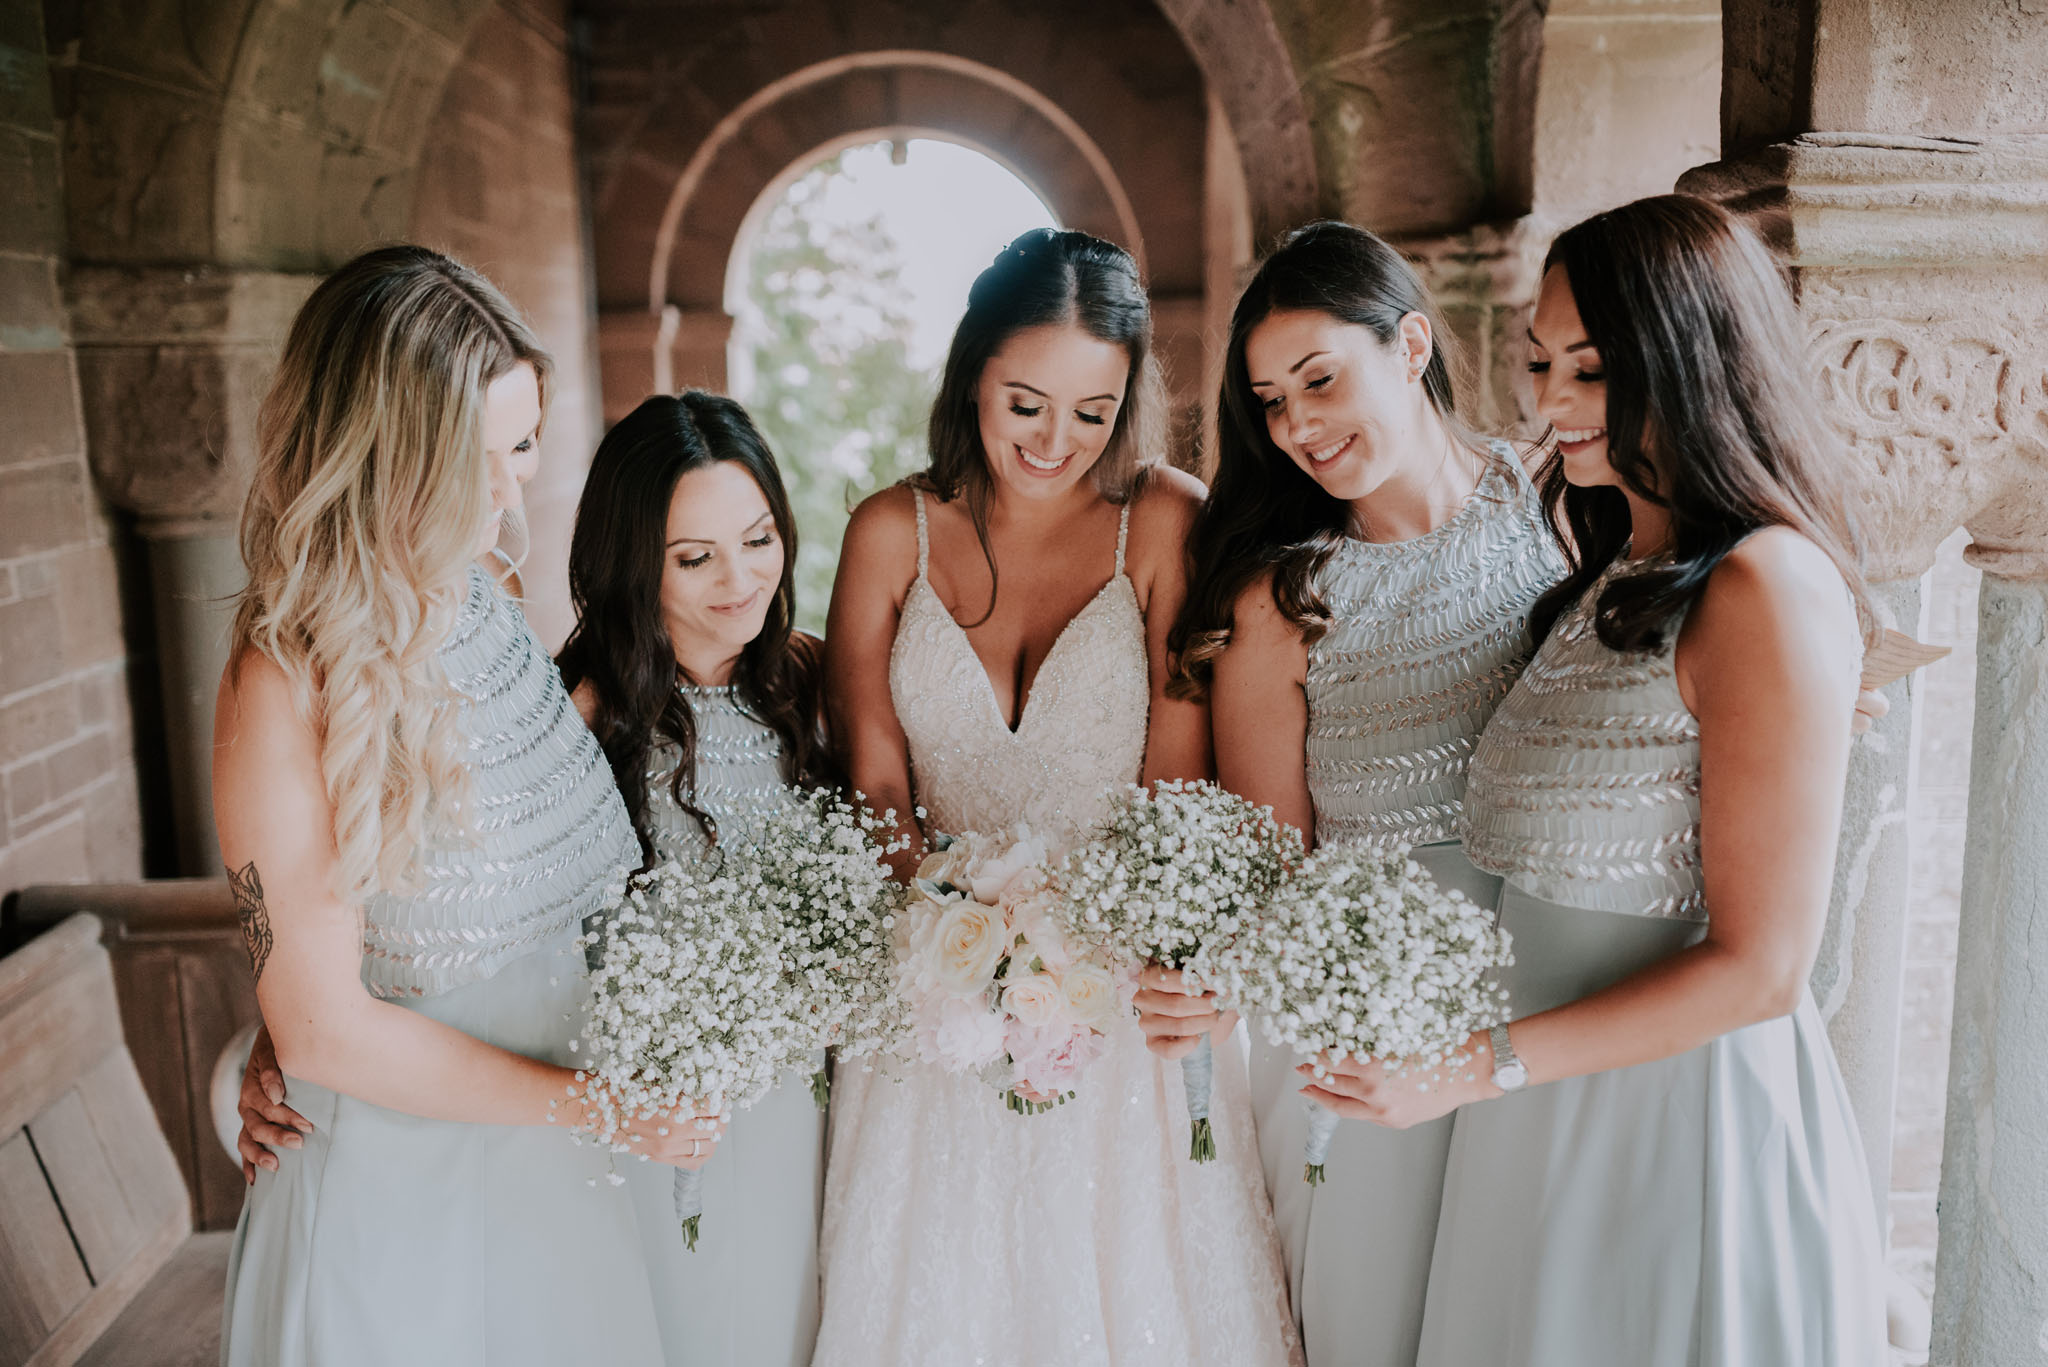 wedding-photographer-glewstone-court-hereford-scott-stockwell-photography278.jpg